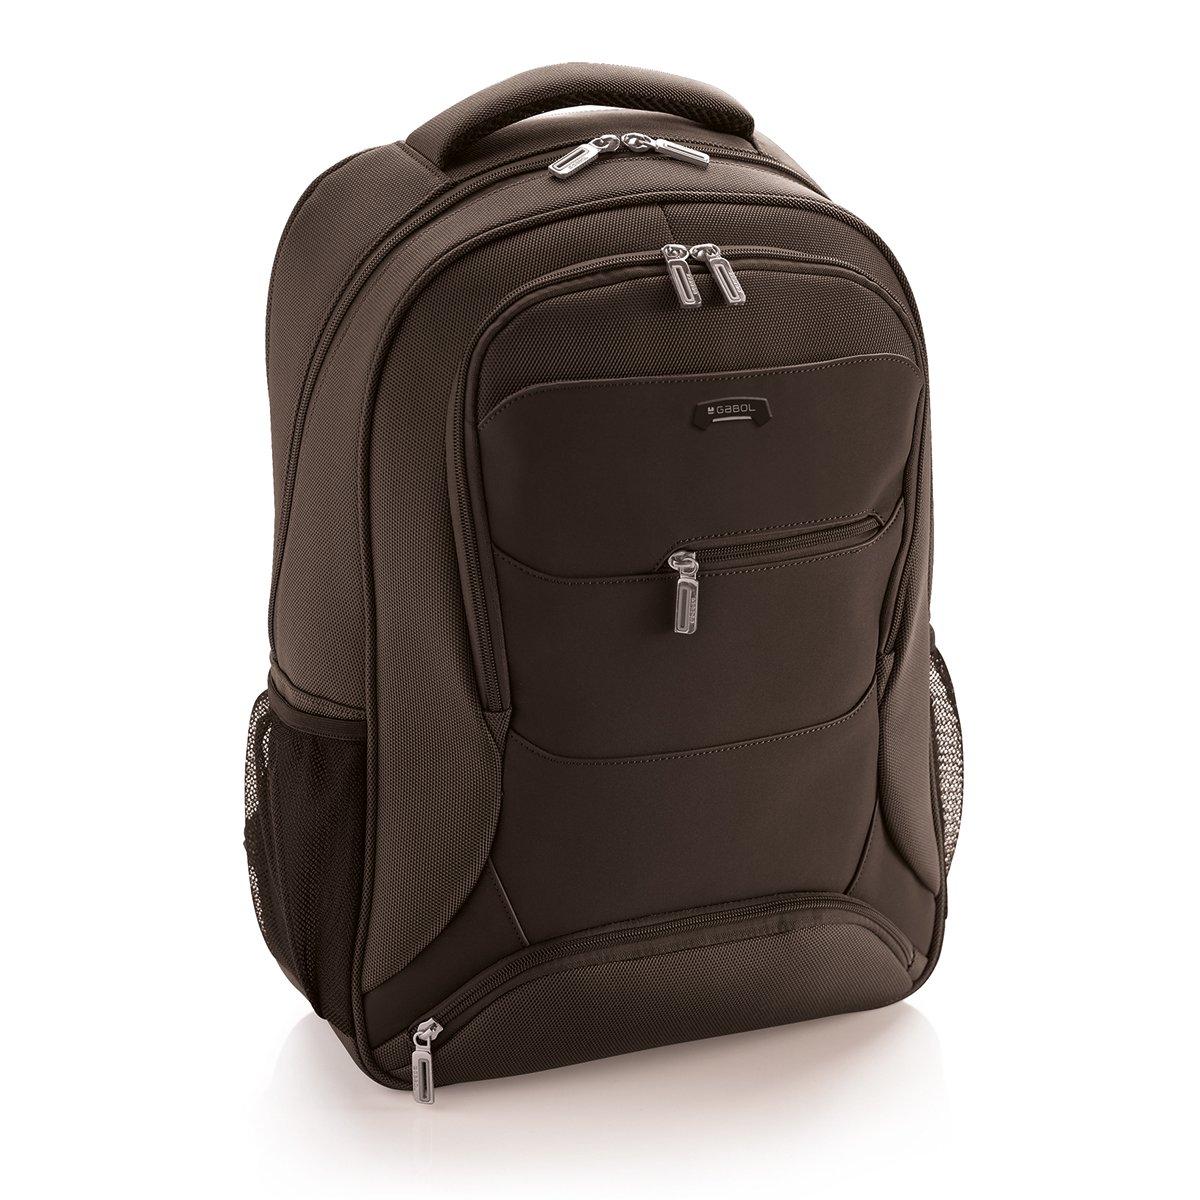 Mochila con porta laptop caf sears com mx me entiende - Notebook con porta parallela ...